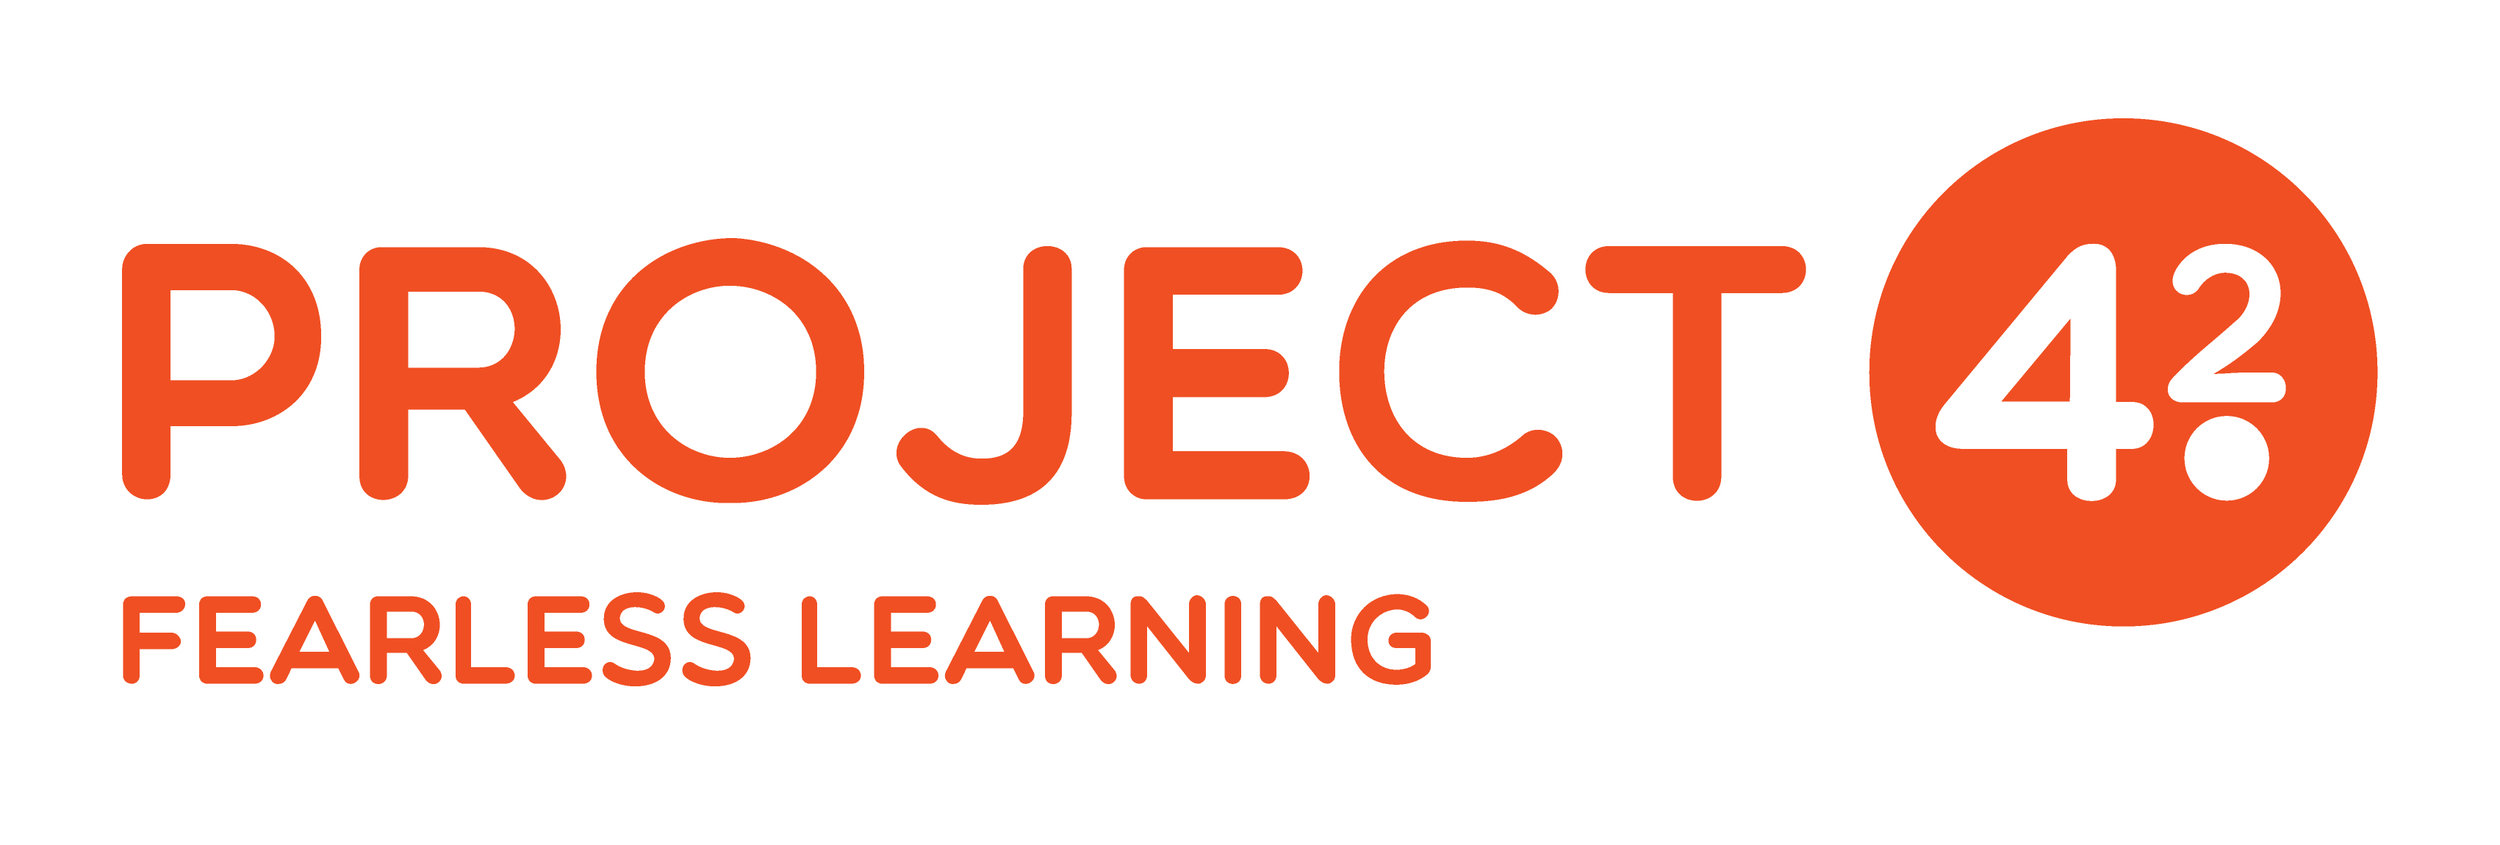 Project-42.jpg